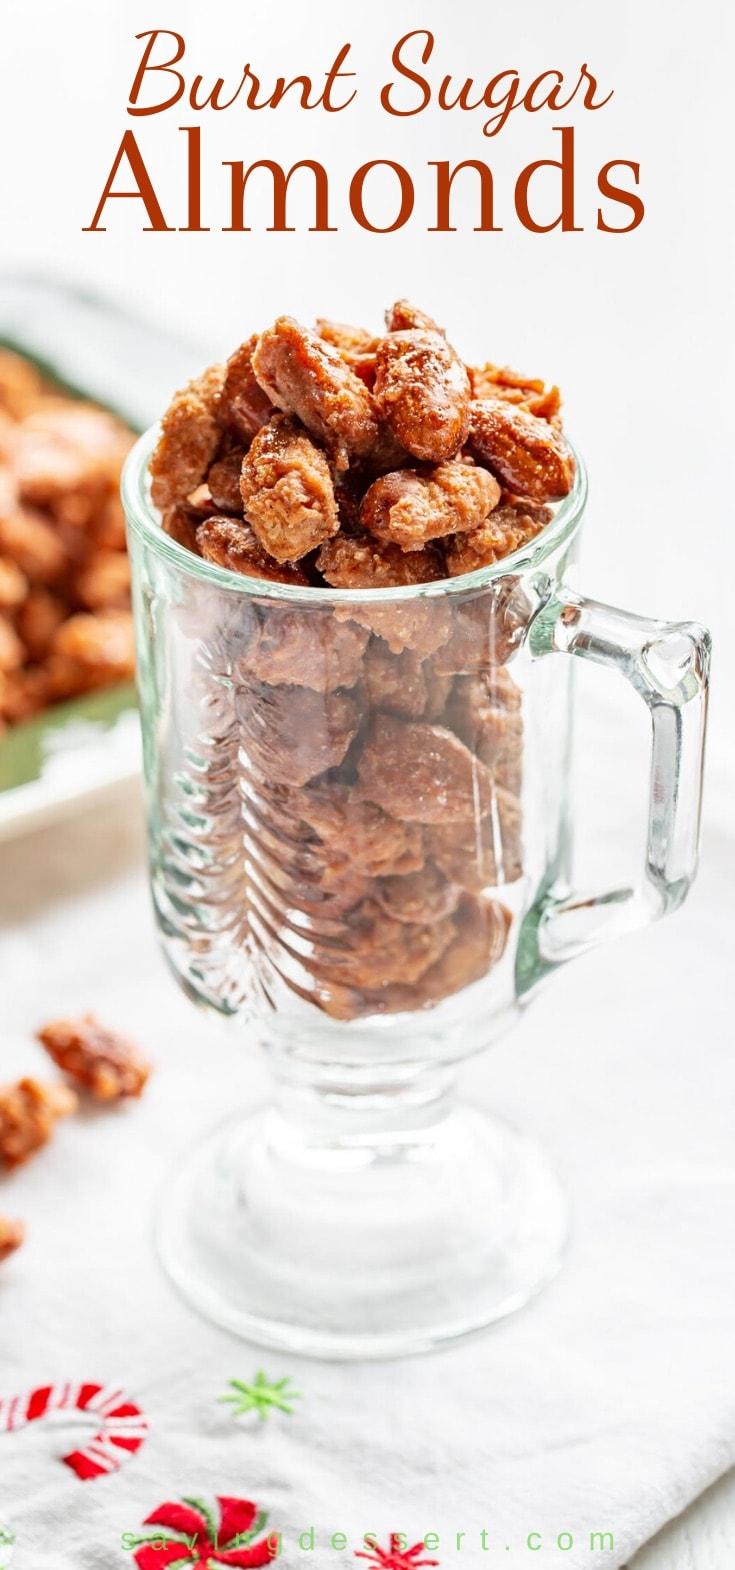 A clear mug of burnt sugar almonds